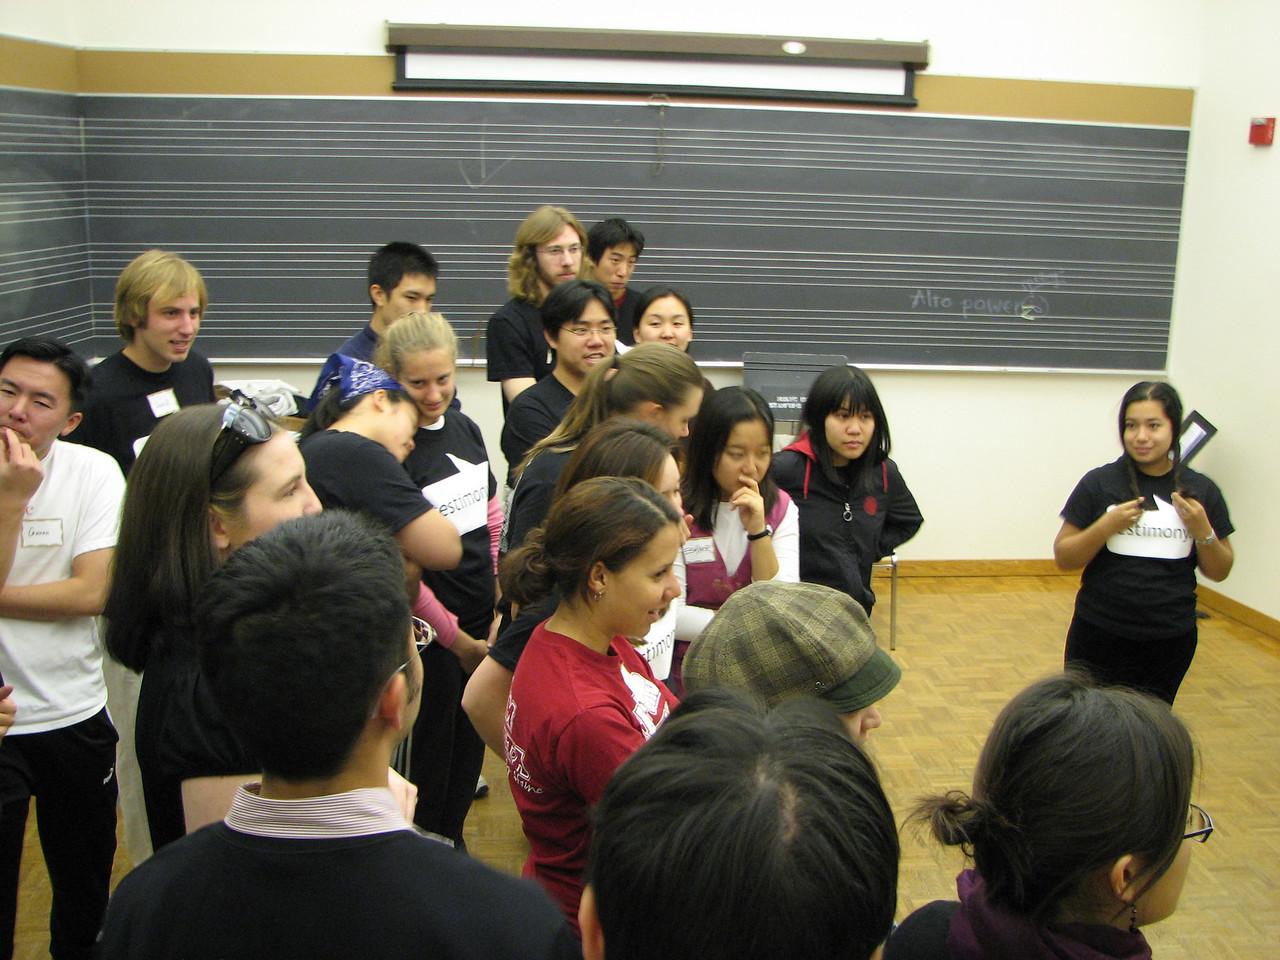 2006 12 02 Sat - Old Tmony practice 2